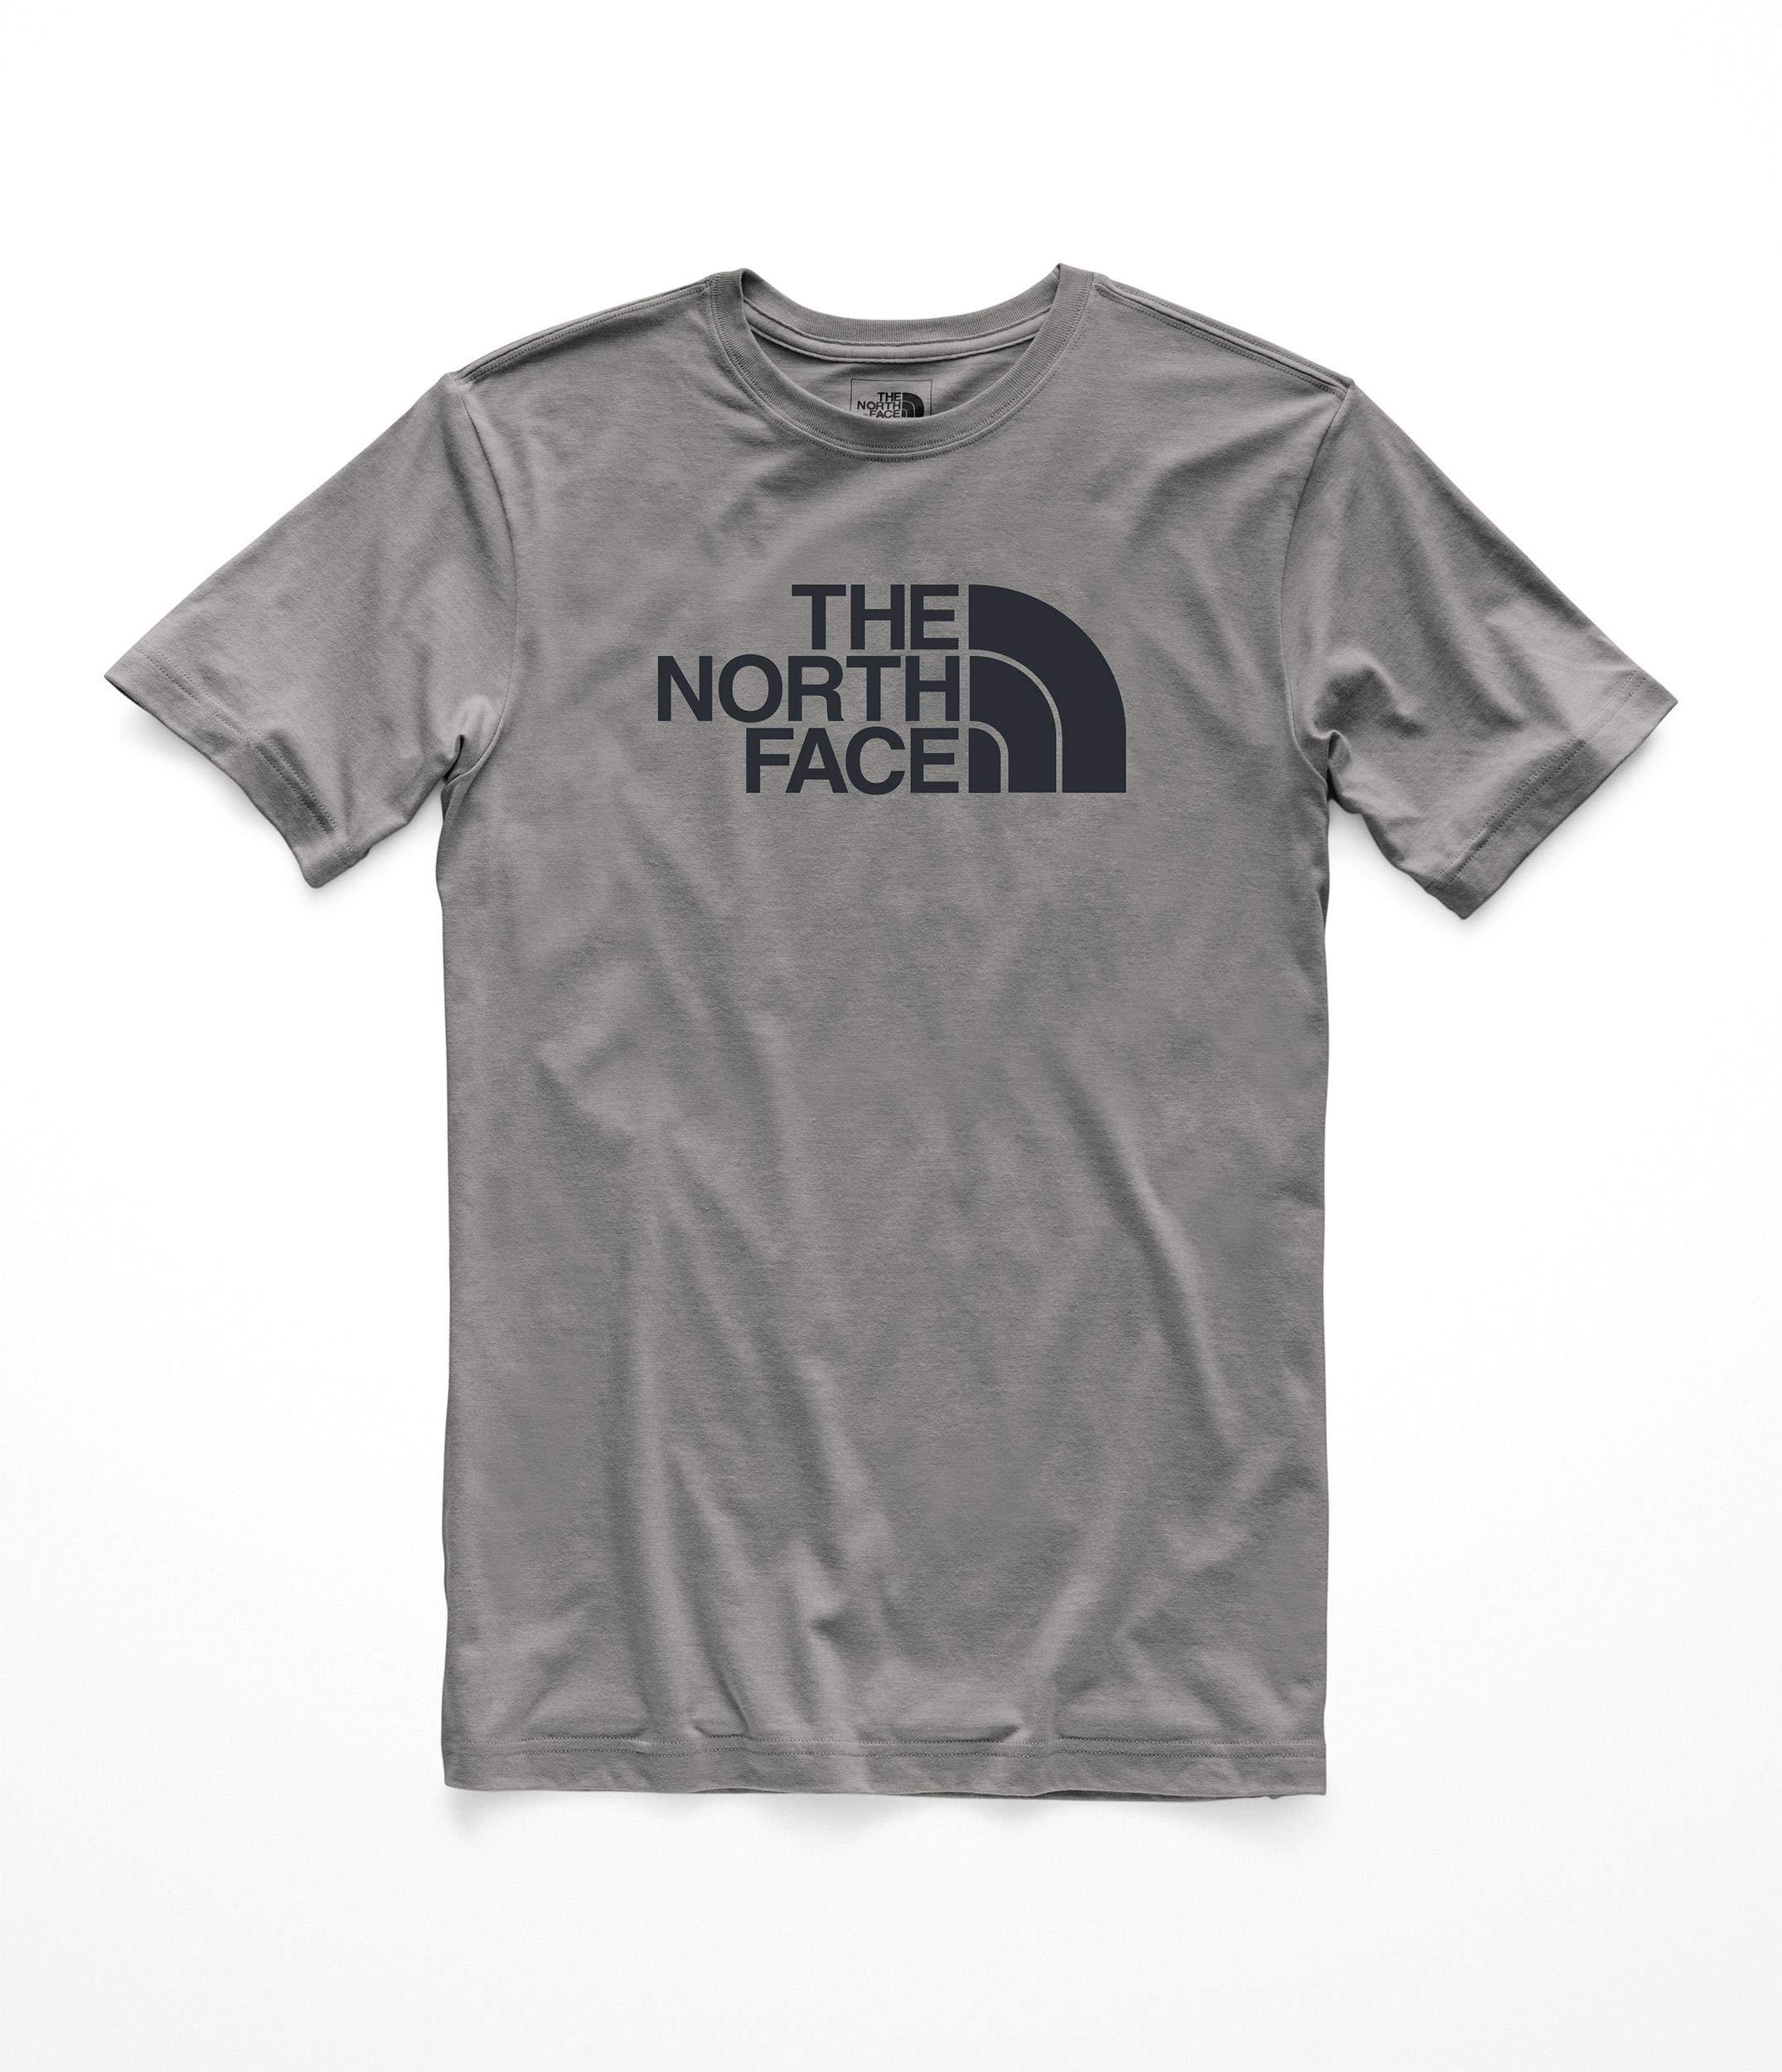 The North Face Mens S/S Half Dome Tri-Blend Tee - TNF Mid Grey Heather & Asphalt Grey - M